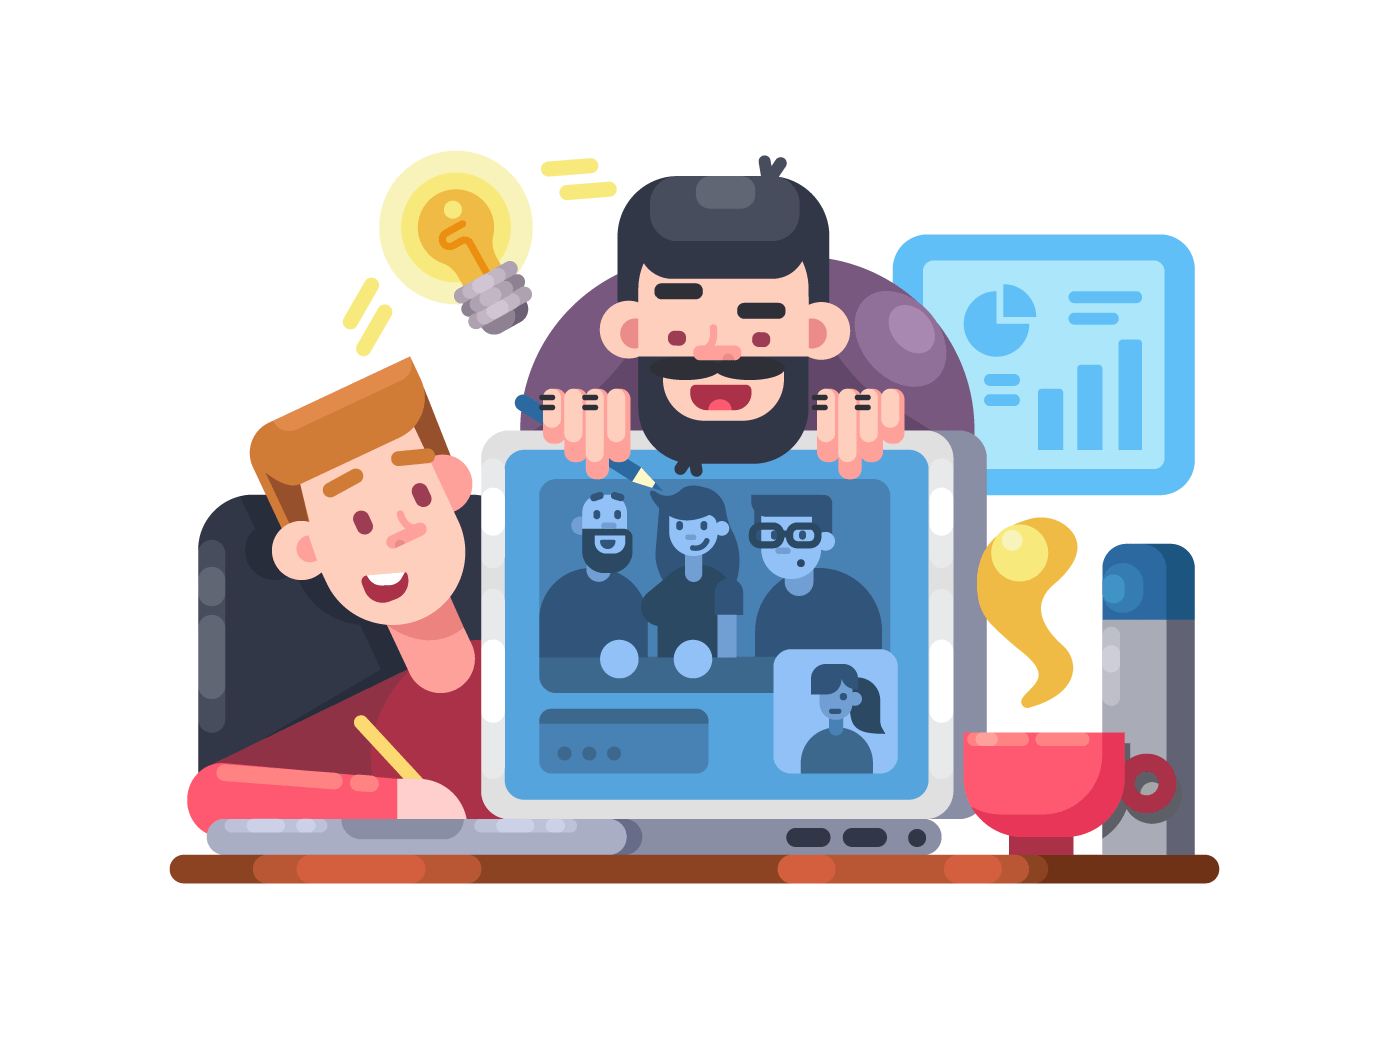 Web conference team illustration